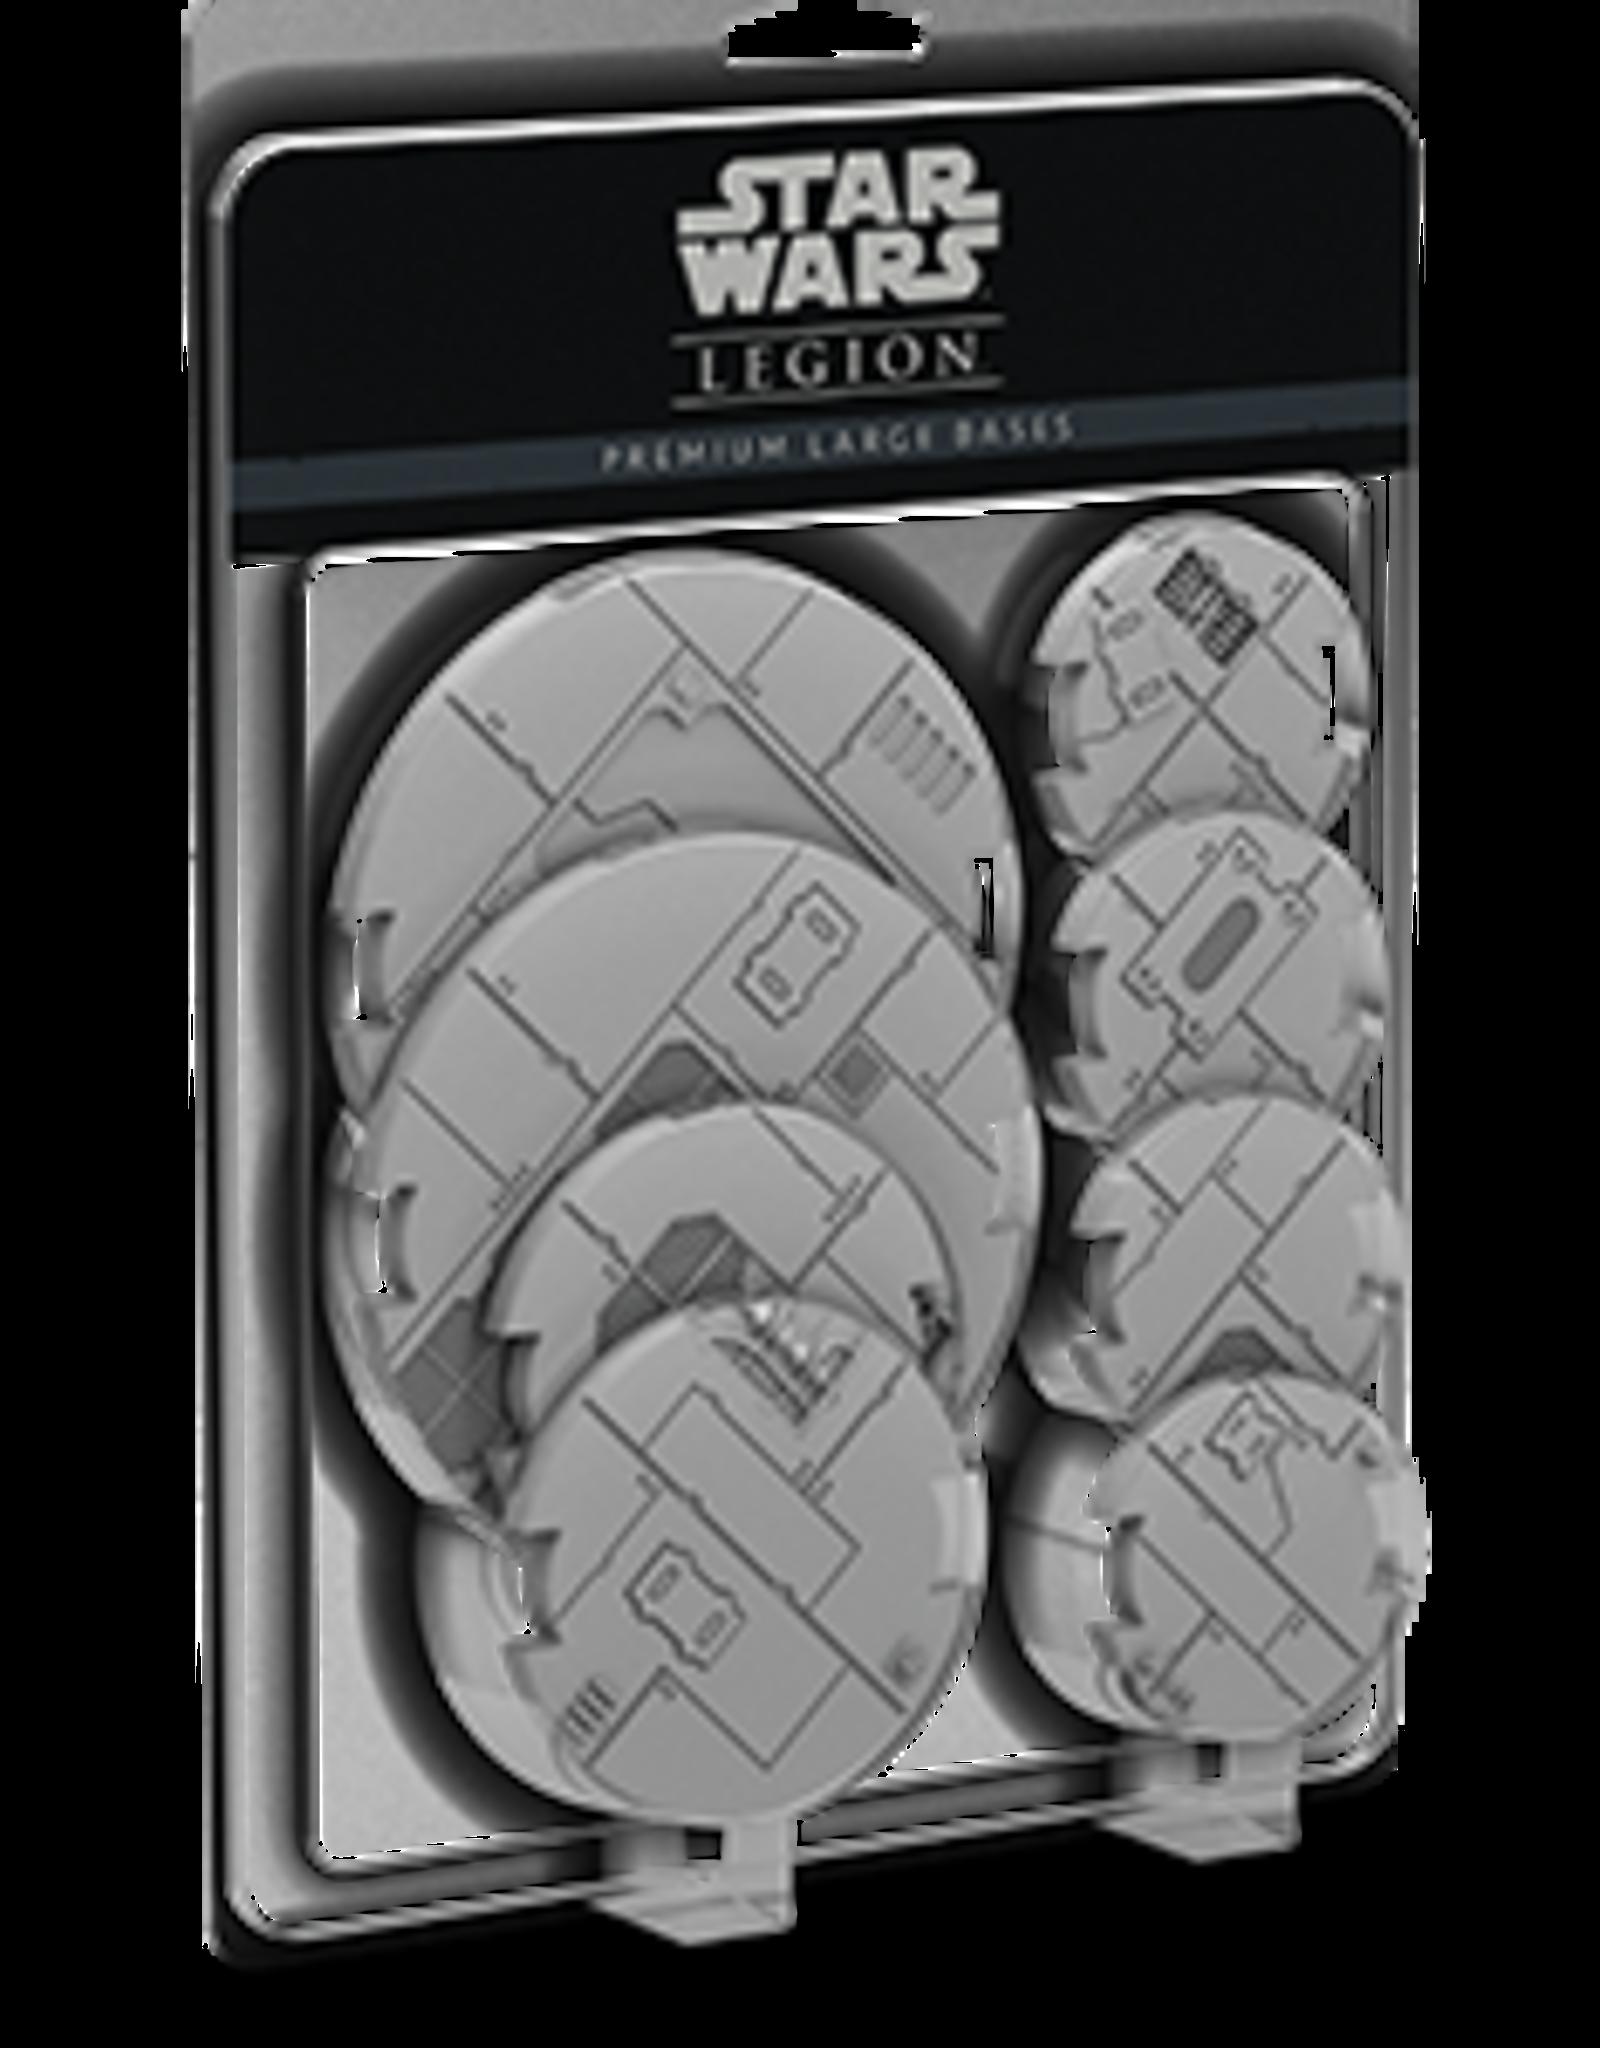 FFG Star Wars Legion: Premium Large Bases